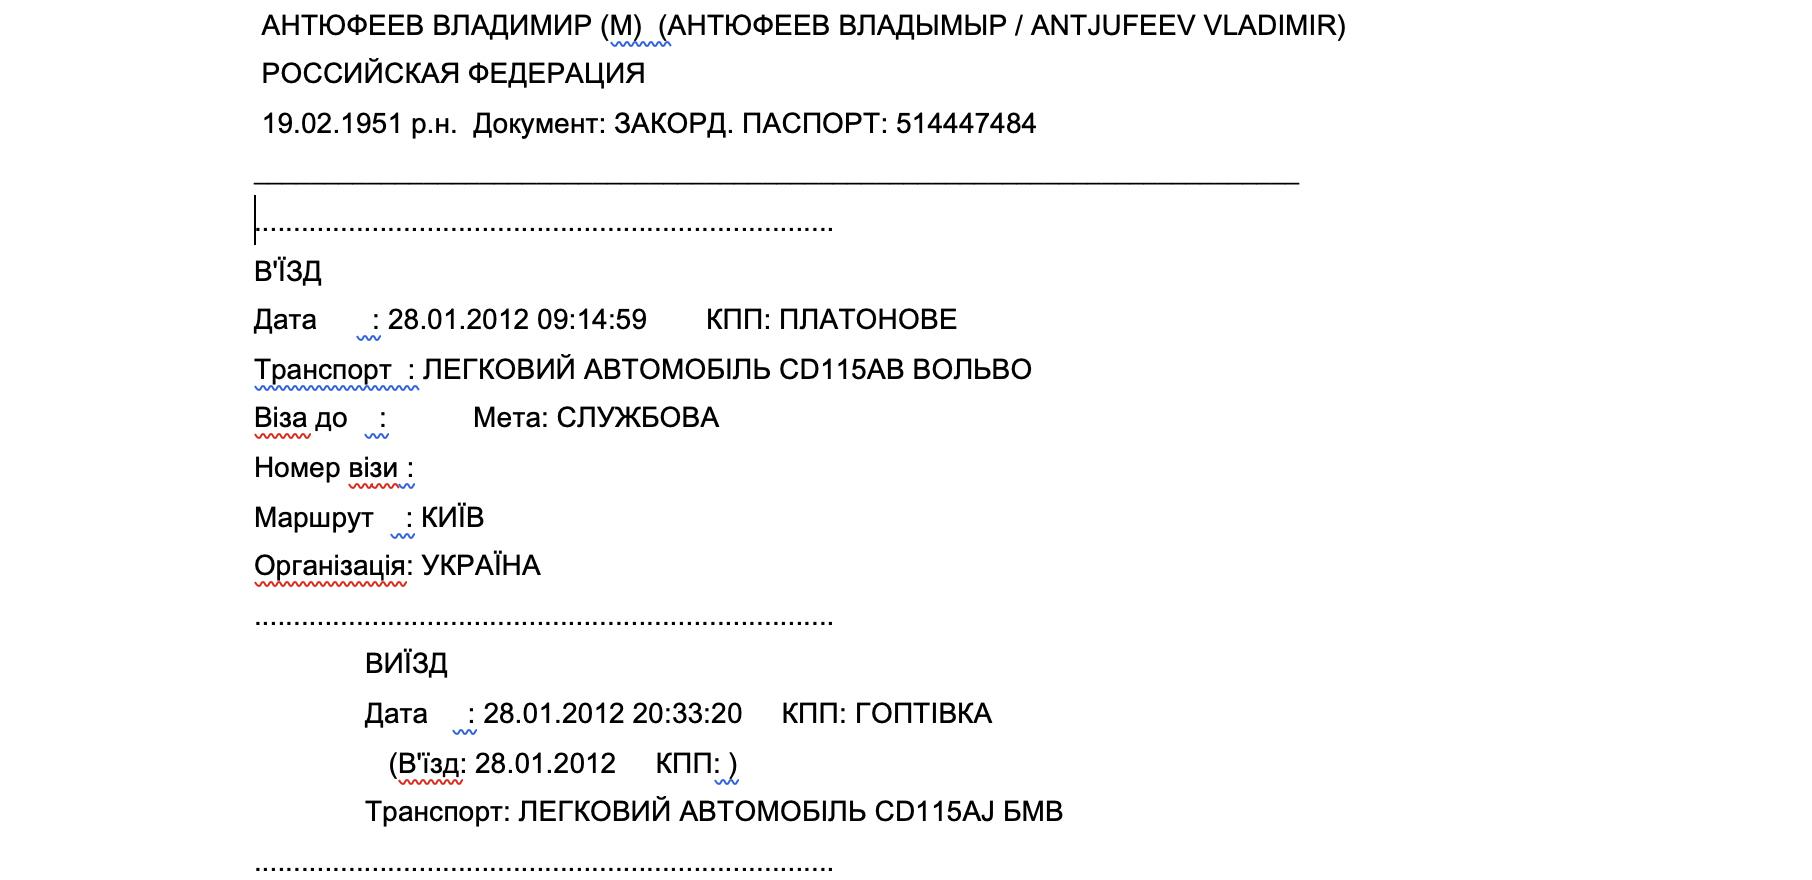 antiufeev-ambasada-ru